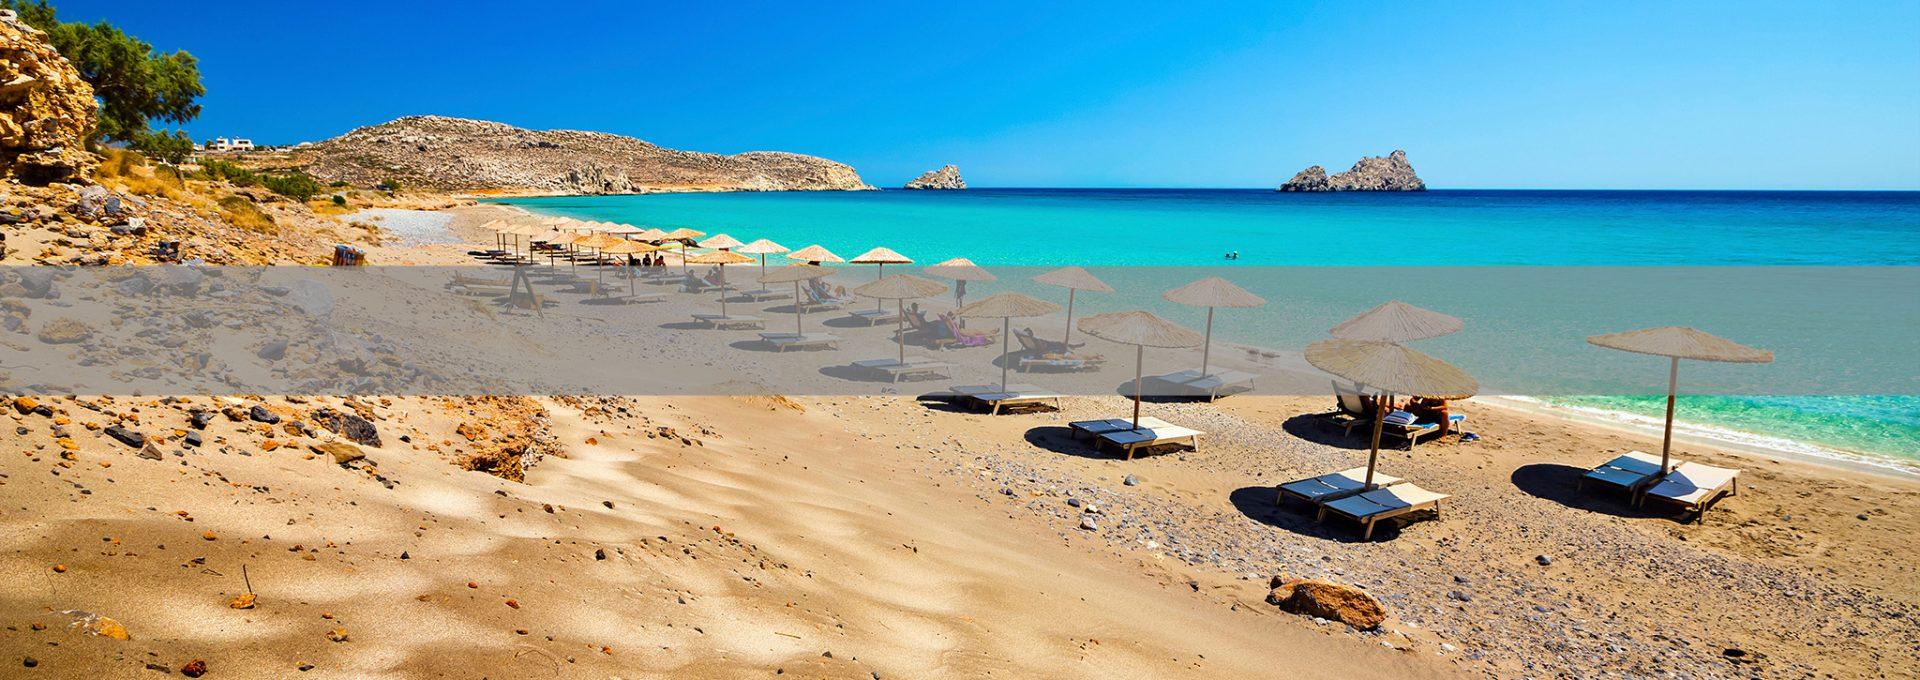 South Crete Tours S.A.